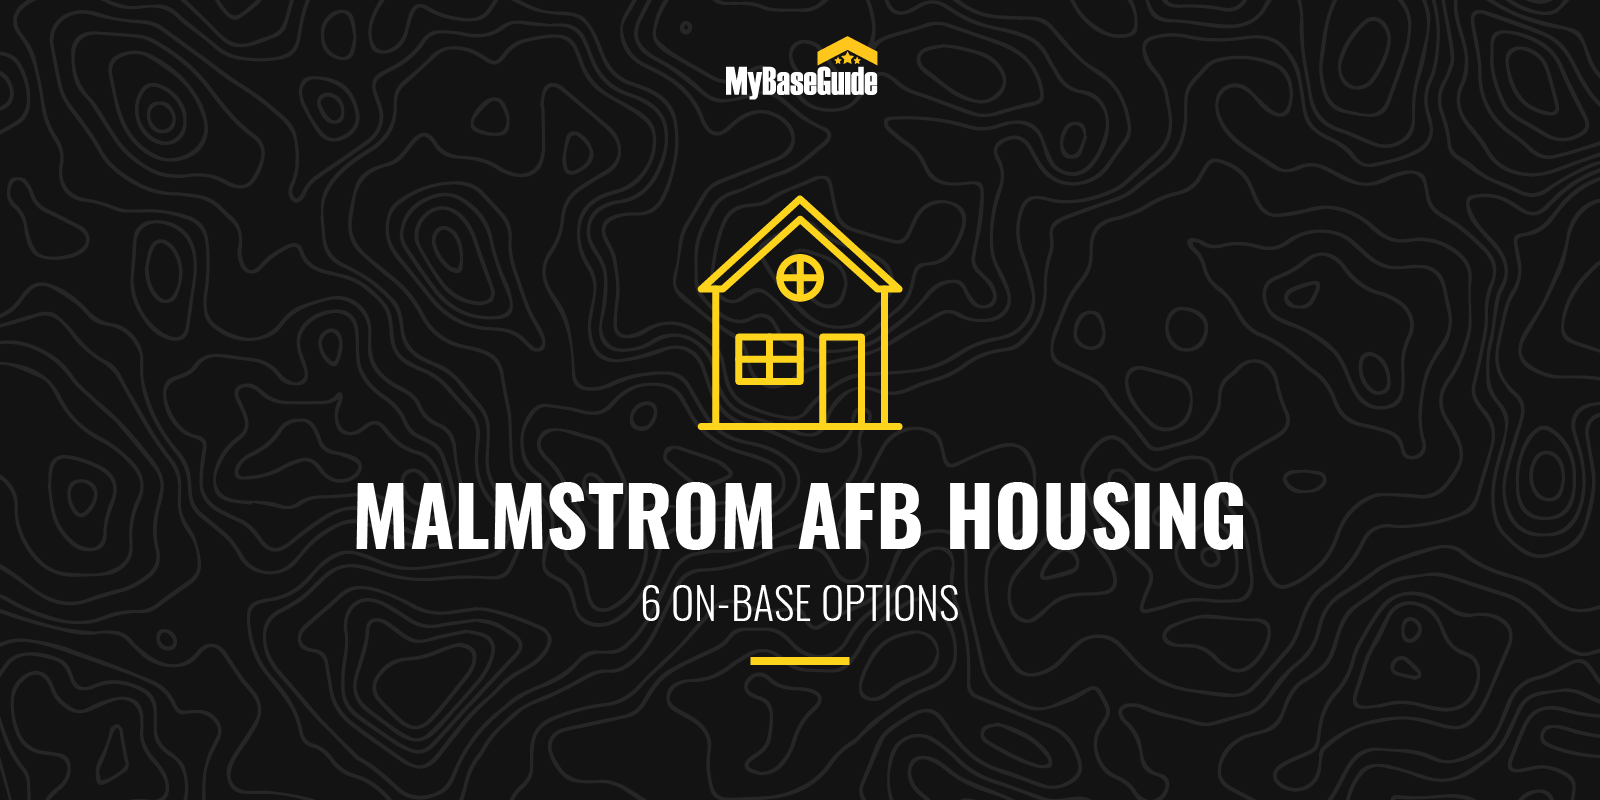 Malmstrom AFB Housing: 6 On-Base Options